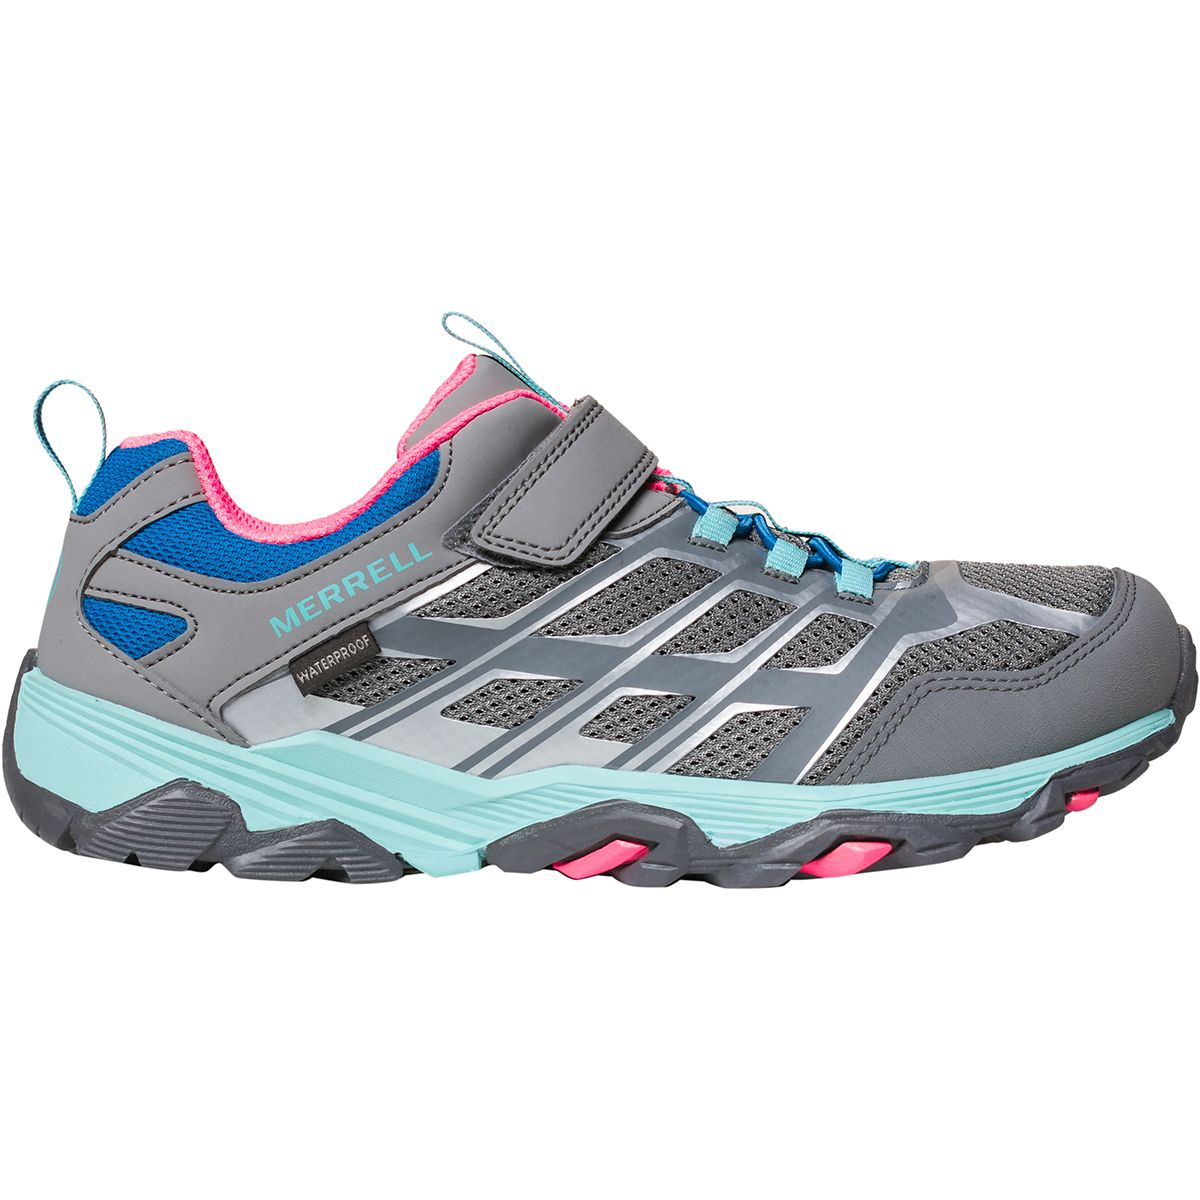 merrell moab fst waterproof light trail shoes - mens room